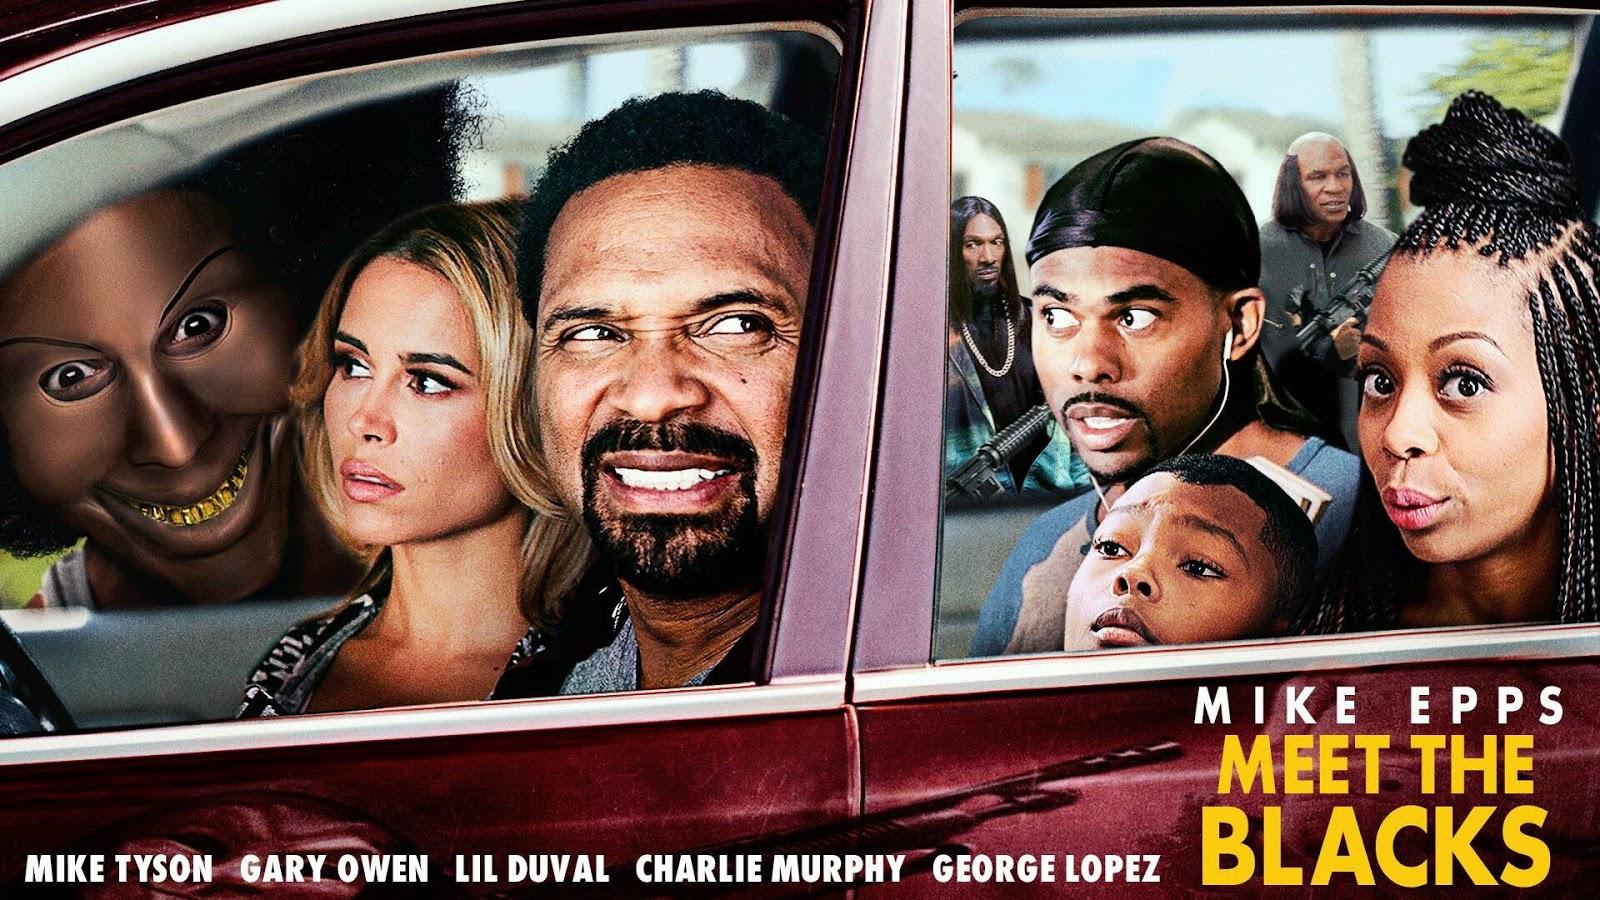 Meet the Blacks 2016 English Movie Download Free HD DVDrip